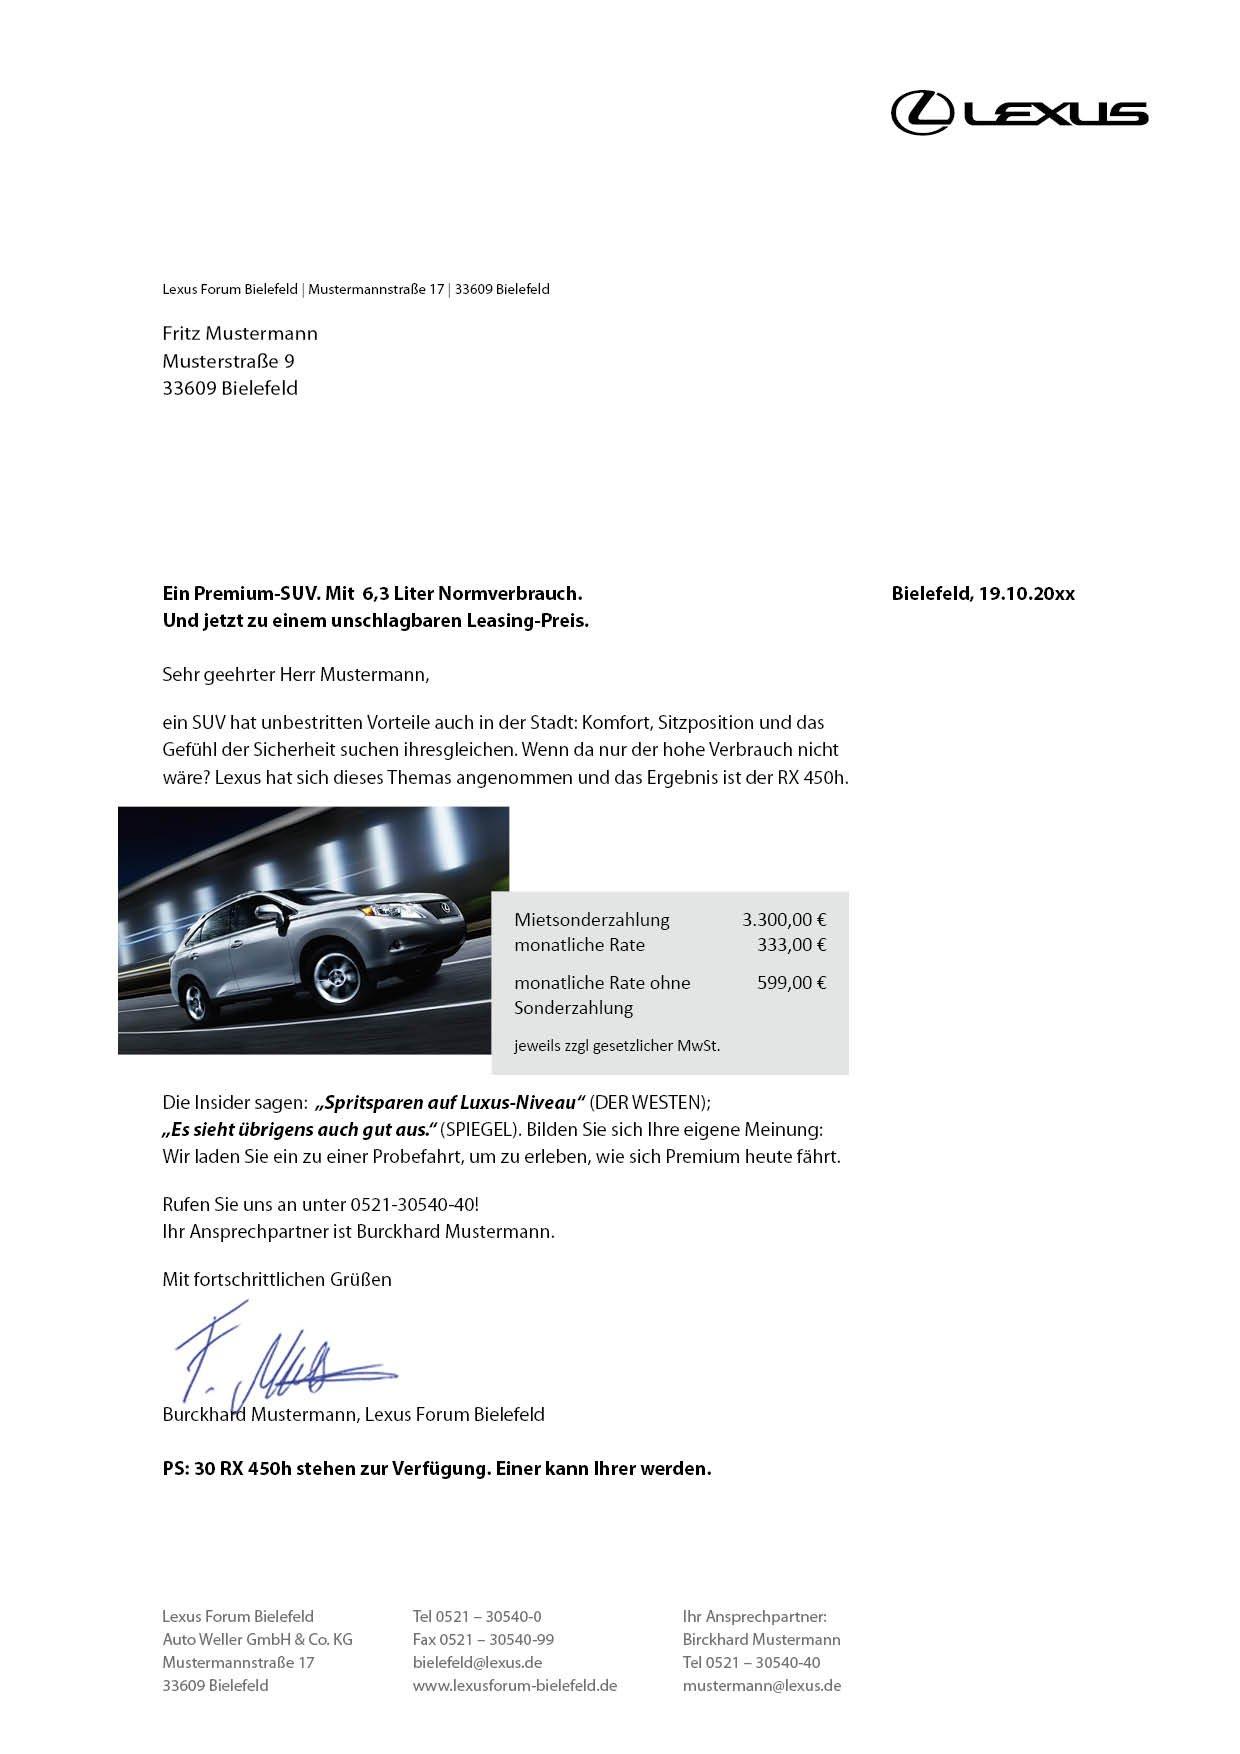 BtoC: Direct Mailing